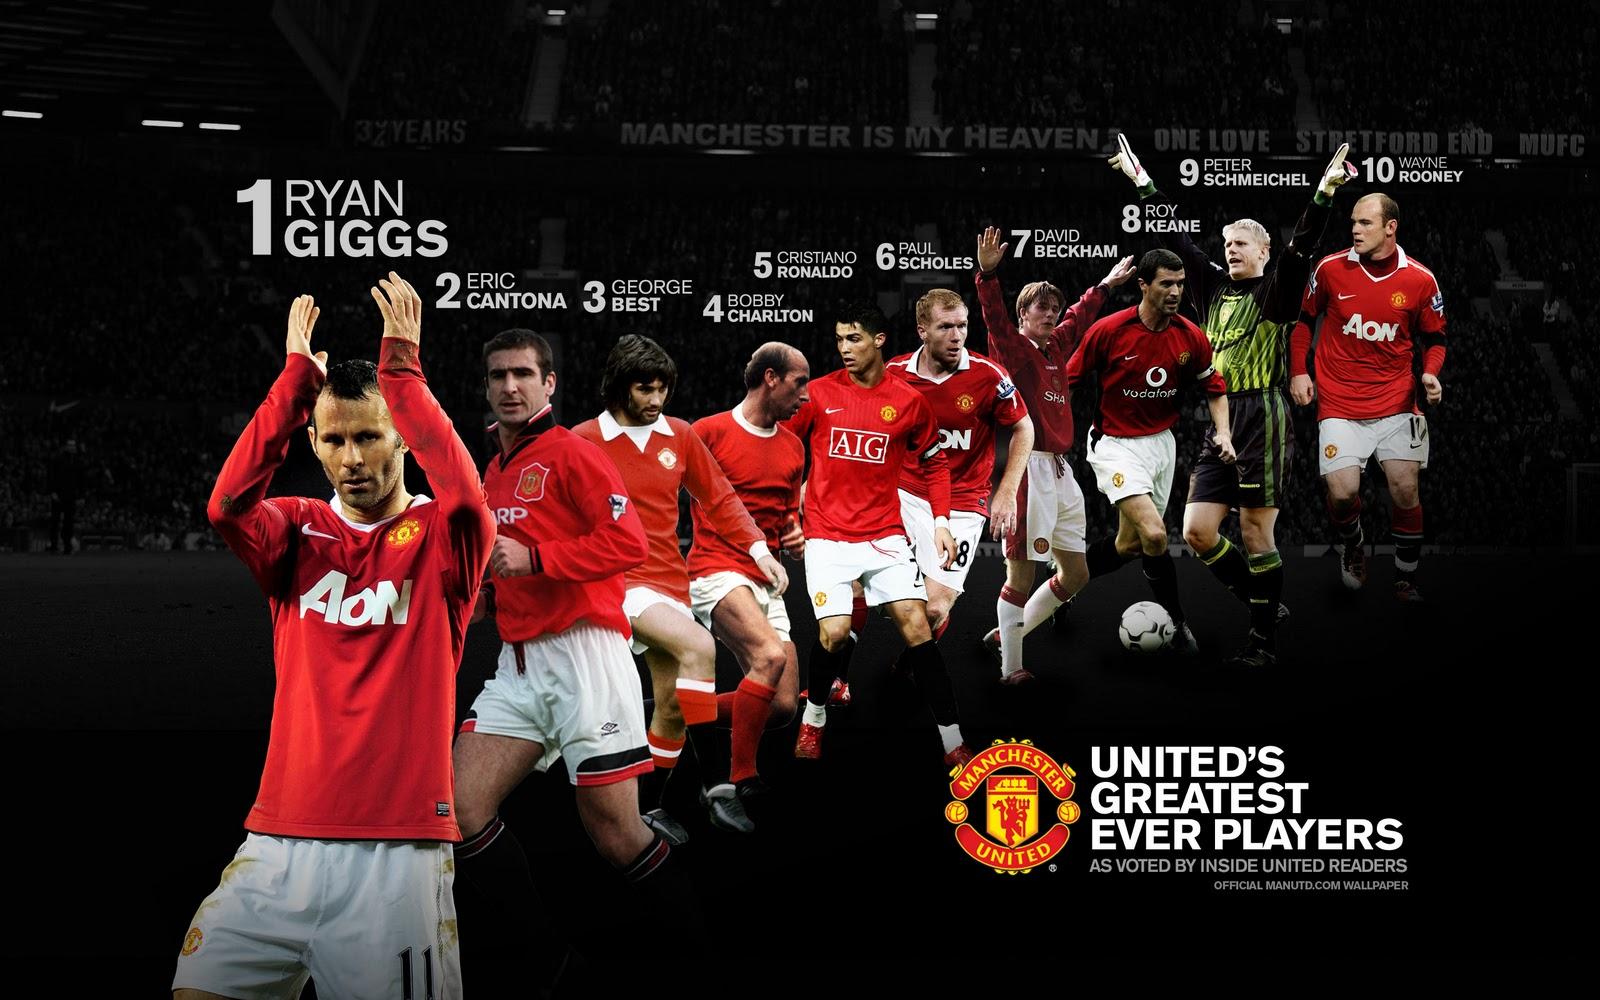 Sport Wallpaper Manchester United: World Sports Hd Wallpapers: Manchester United Hd